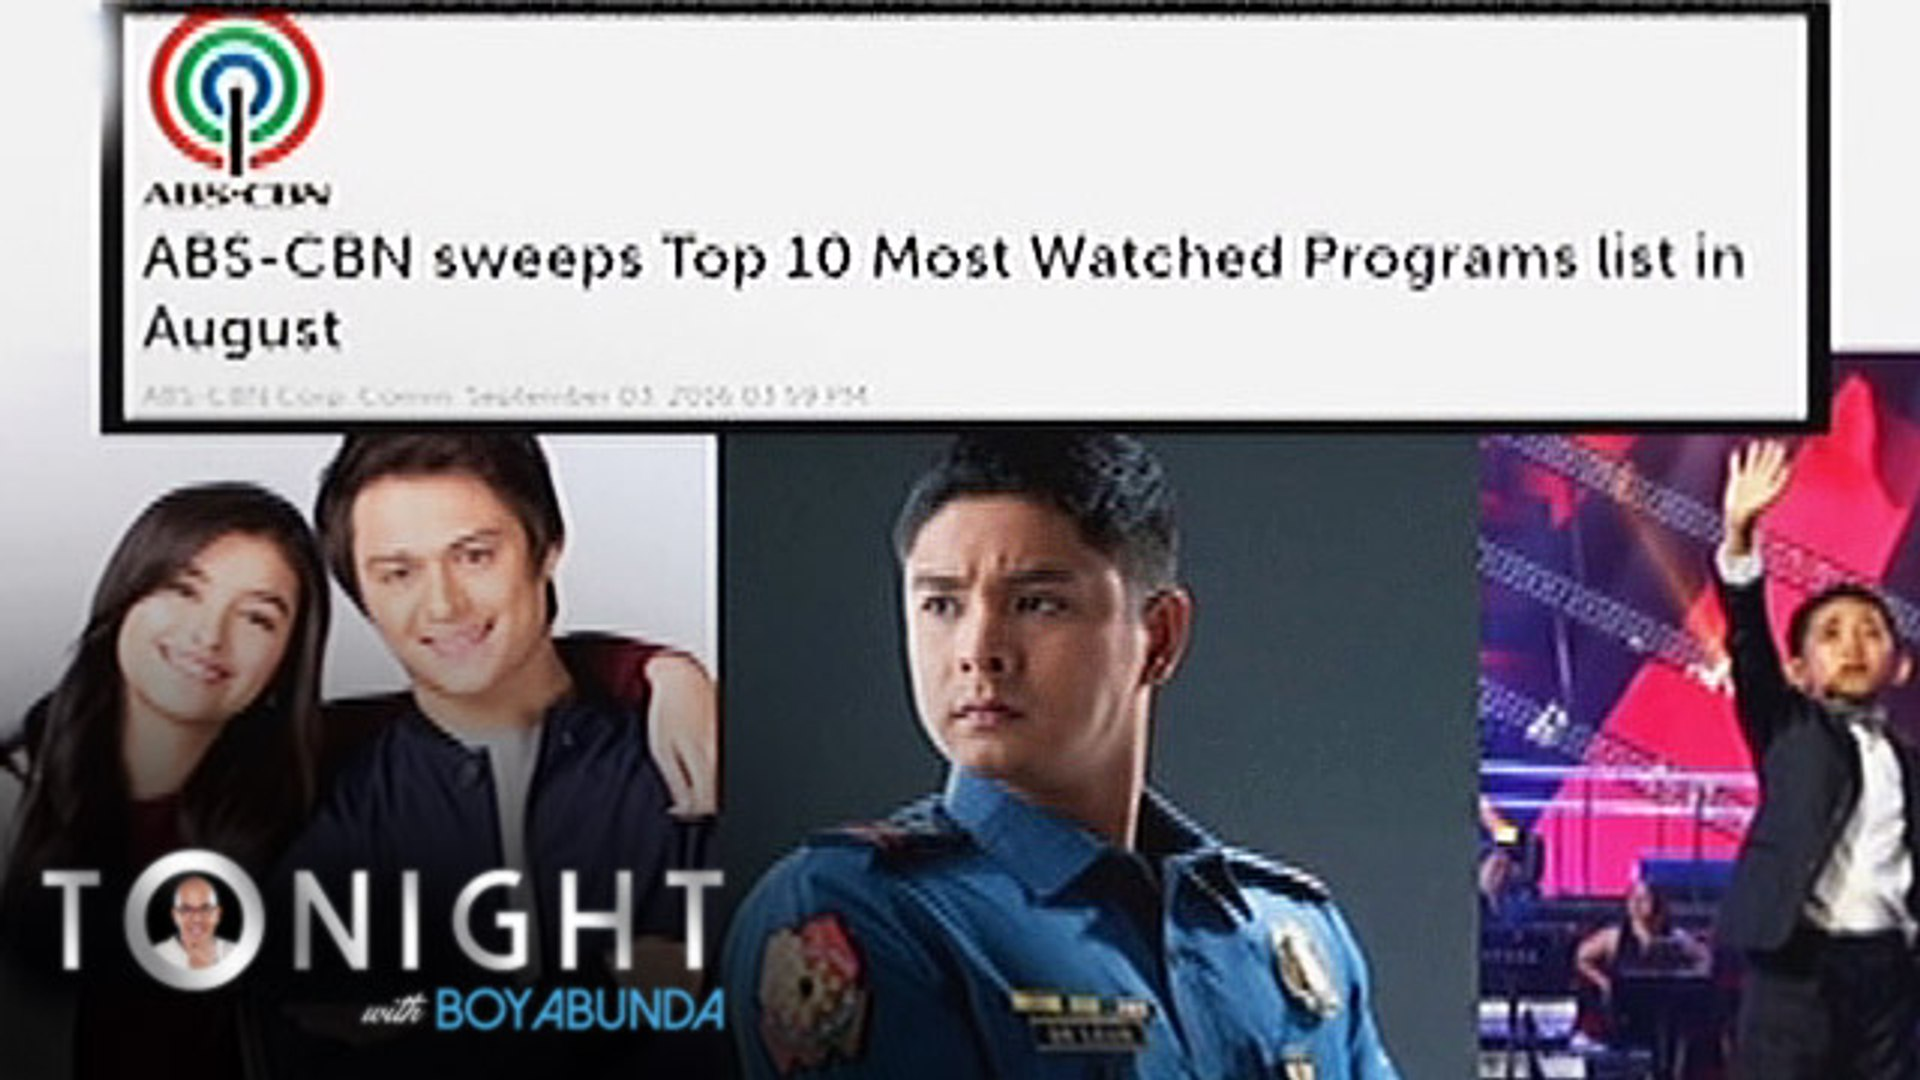 TWBA: Top 10 most watched TV programs in August